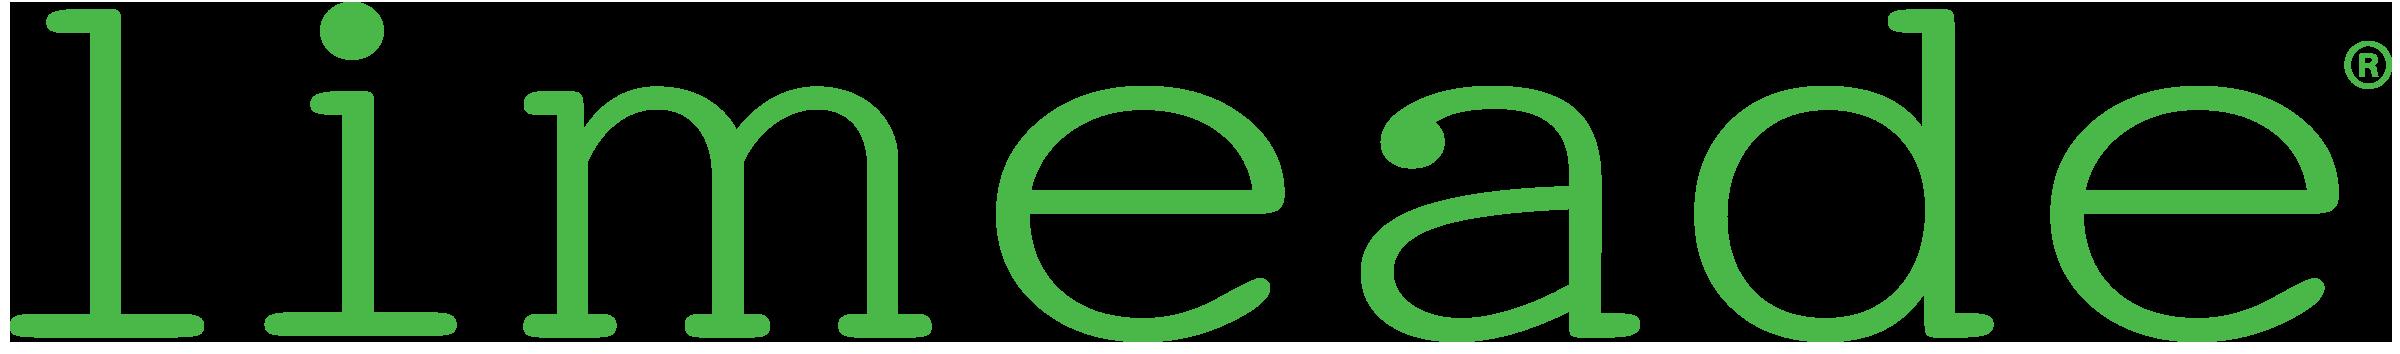 Limeade_logo.png